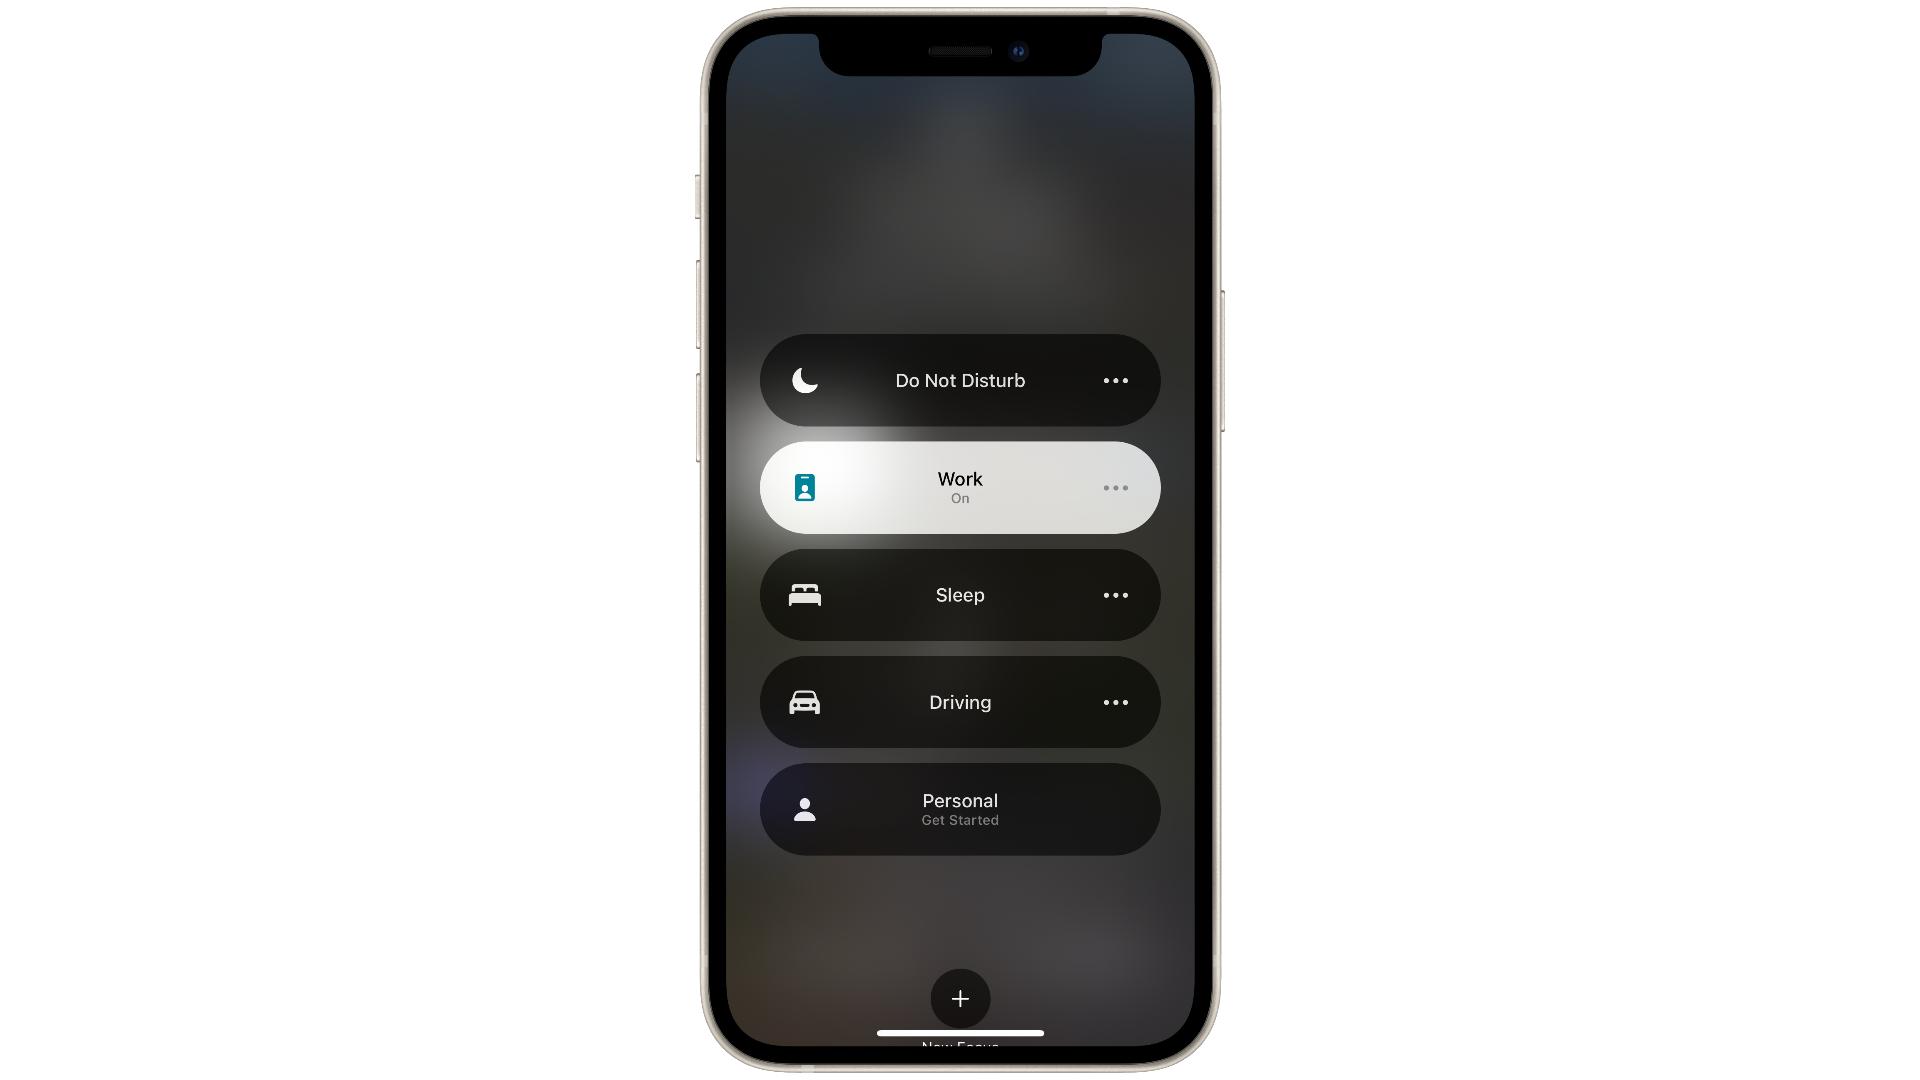 Focus settings in iOS 15